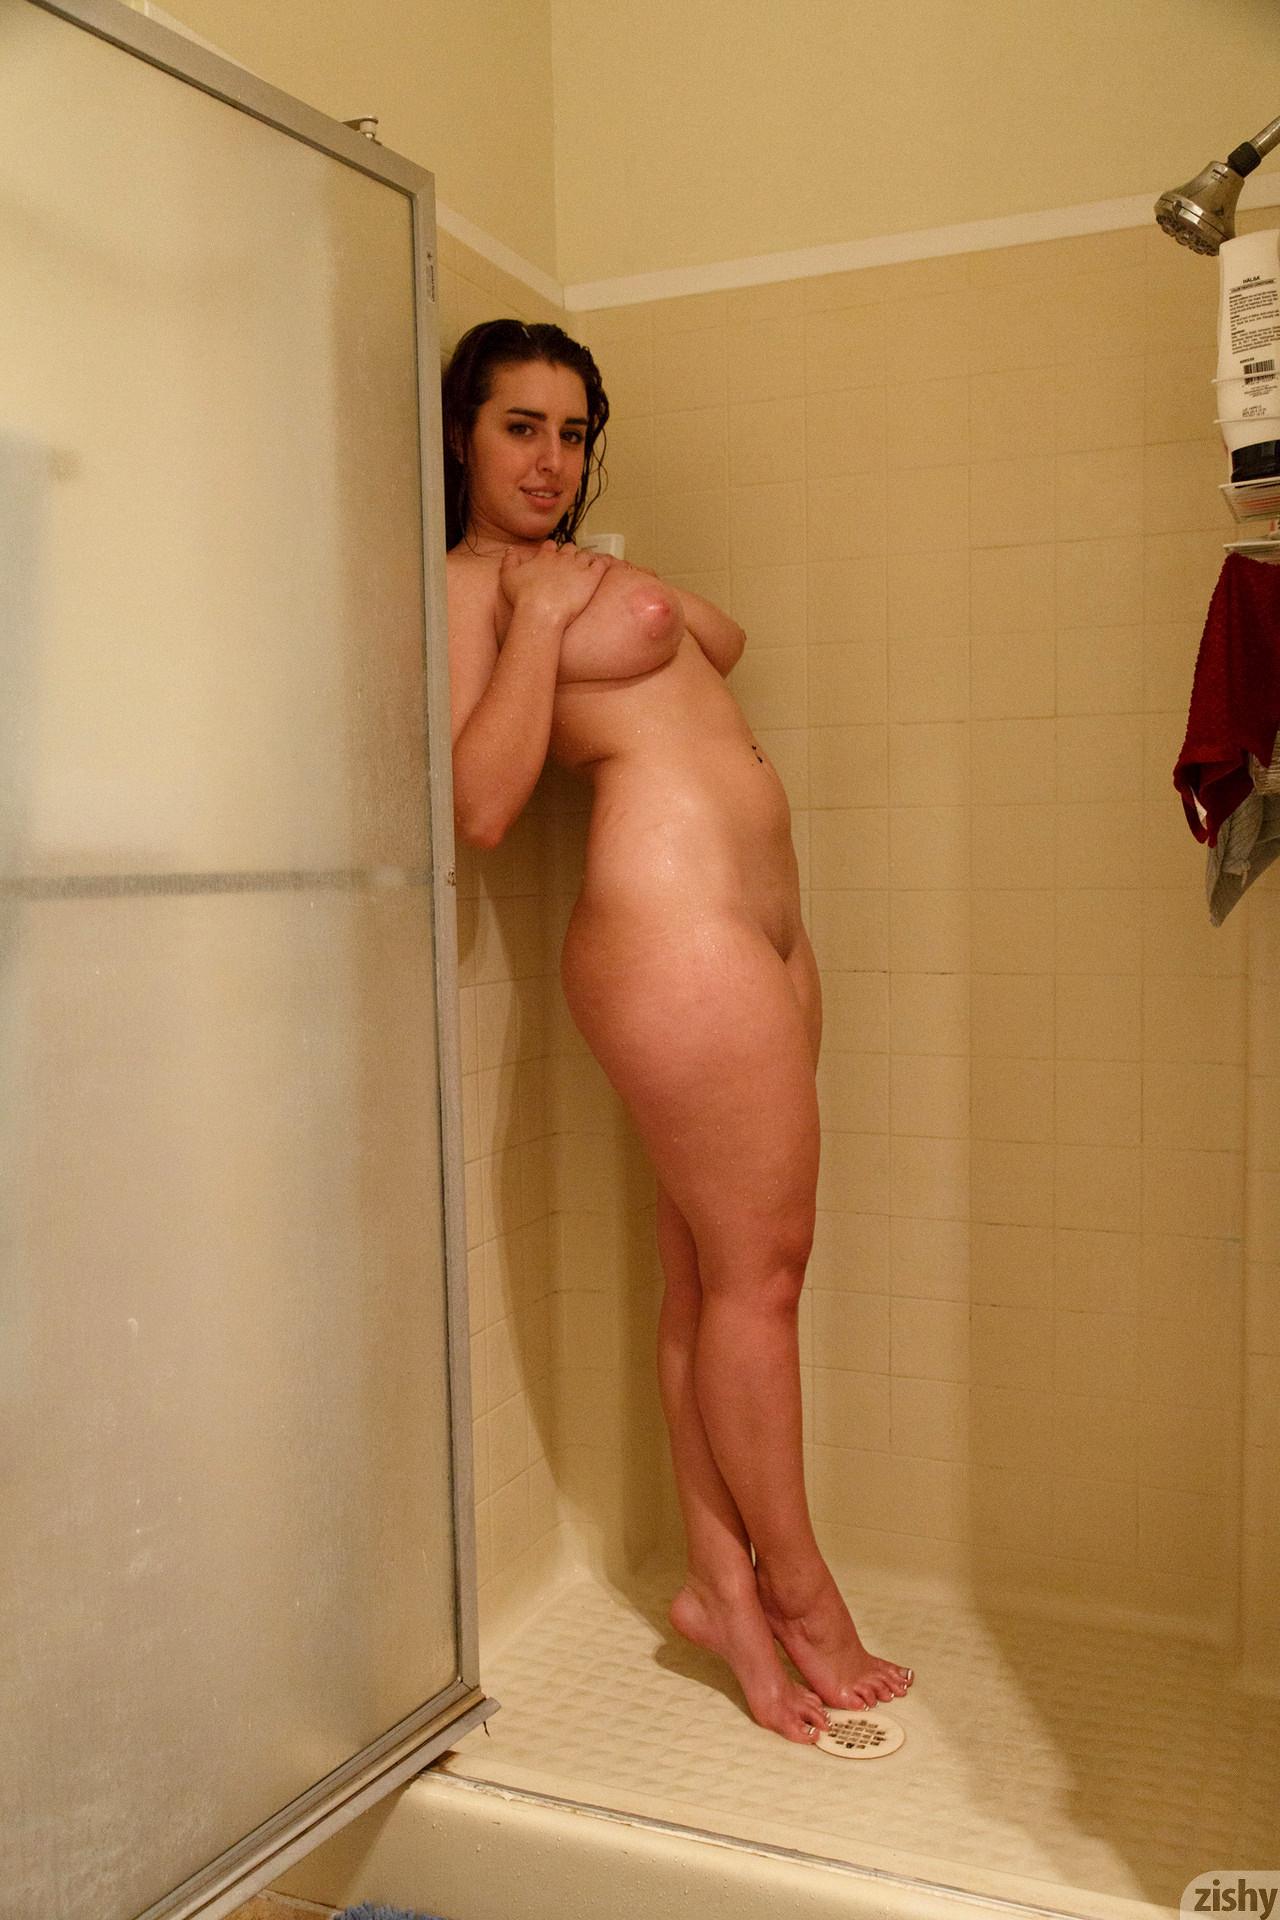 Zishy Lanie Morgan Sexalbums Solo Girls Nong Sexphotos-5216